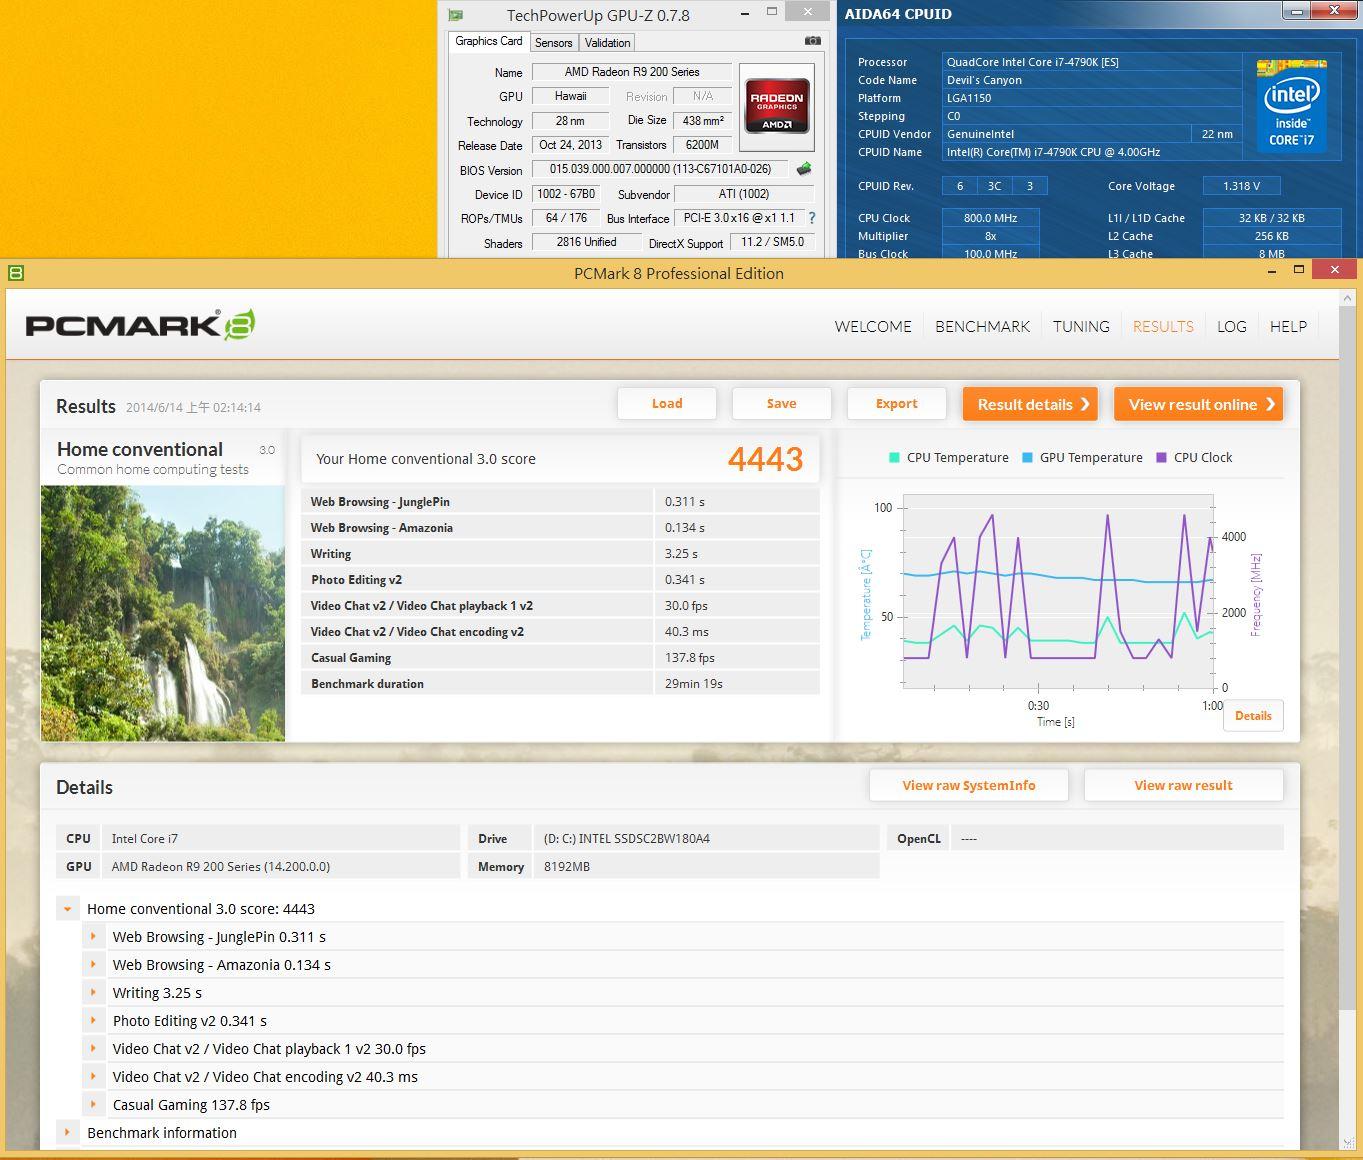 [XF] 點燃心中小惡魔 能效再創新巔峰Intel Corei7-4790K評測